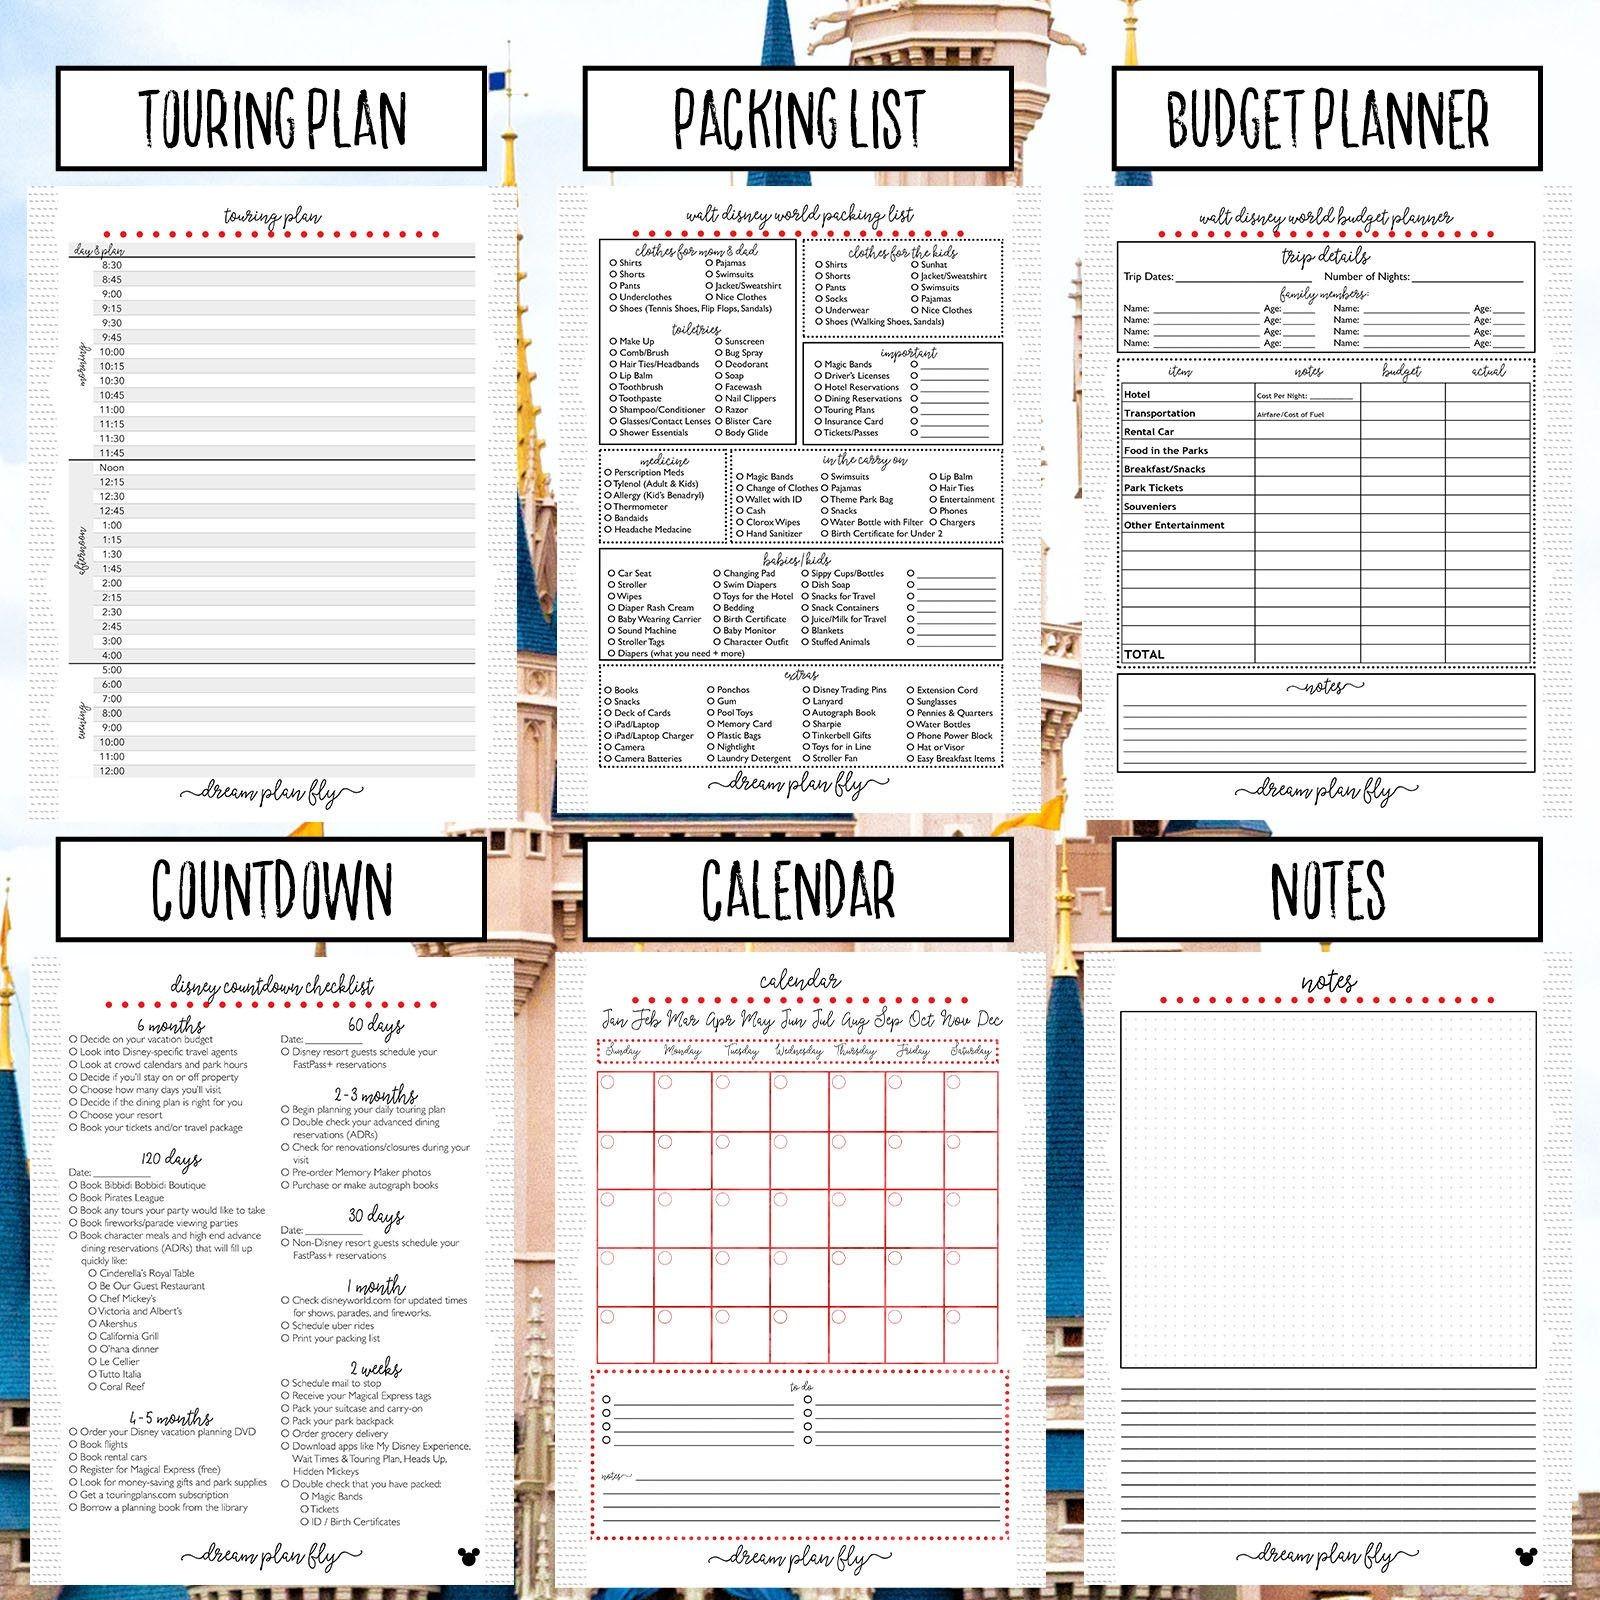 2019 Calendar Planner Book Más Arriba-a-fecha Ultimate Walt Disney World Planner Create Your Own Disney World Of 2019 Calendar Planner Book Más Recientes 5 Star Fice 2019 Year Planner Mounted Landscape with Planner Kit